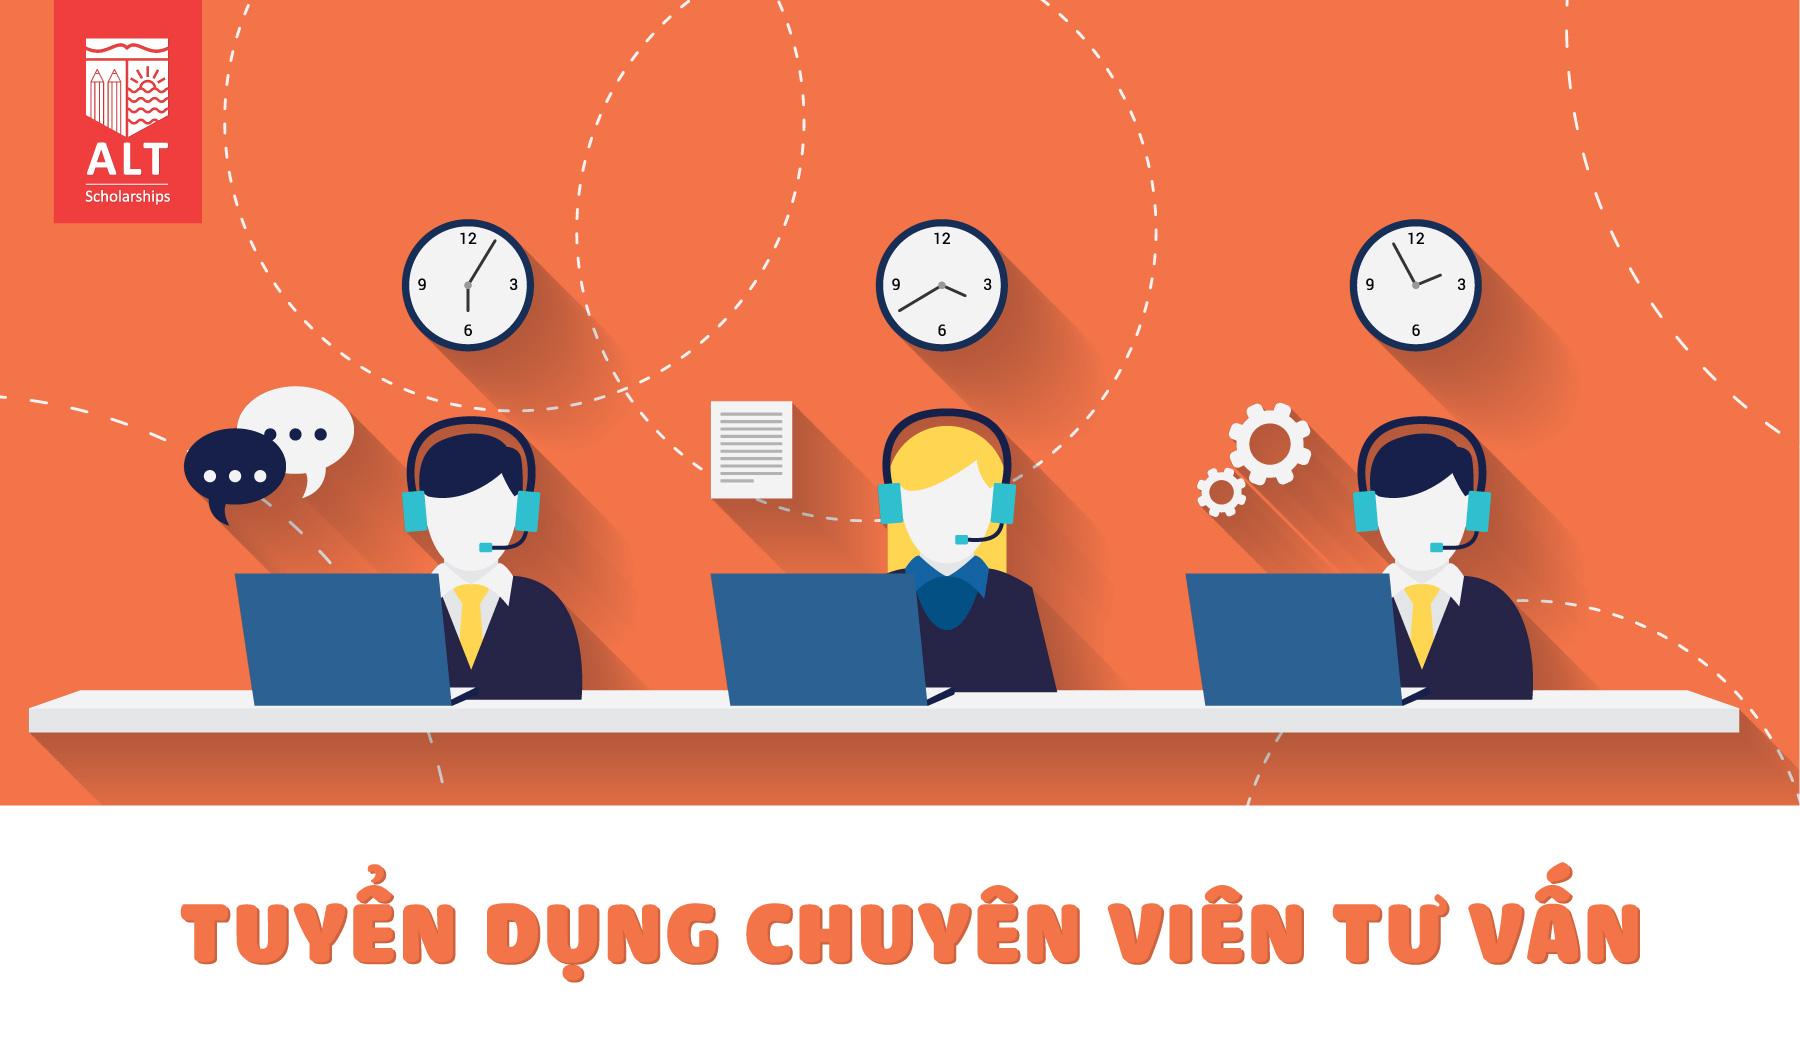 Tuyen Dung Chuyen Vien Tu Van